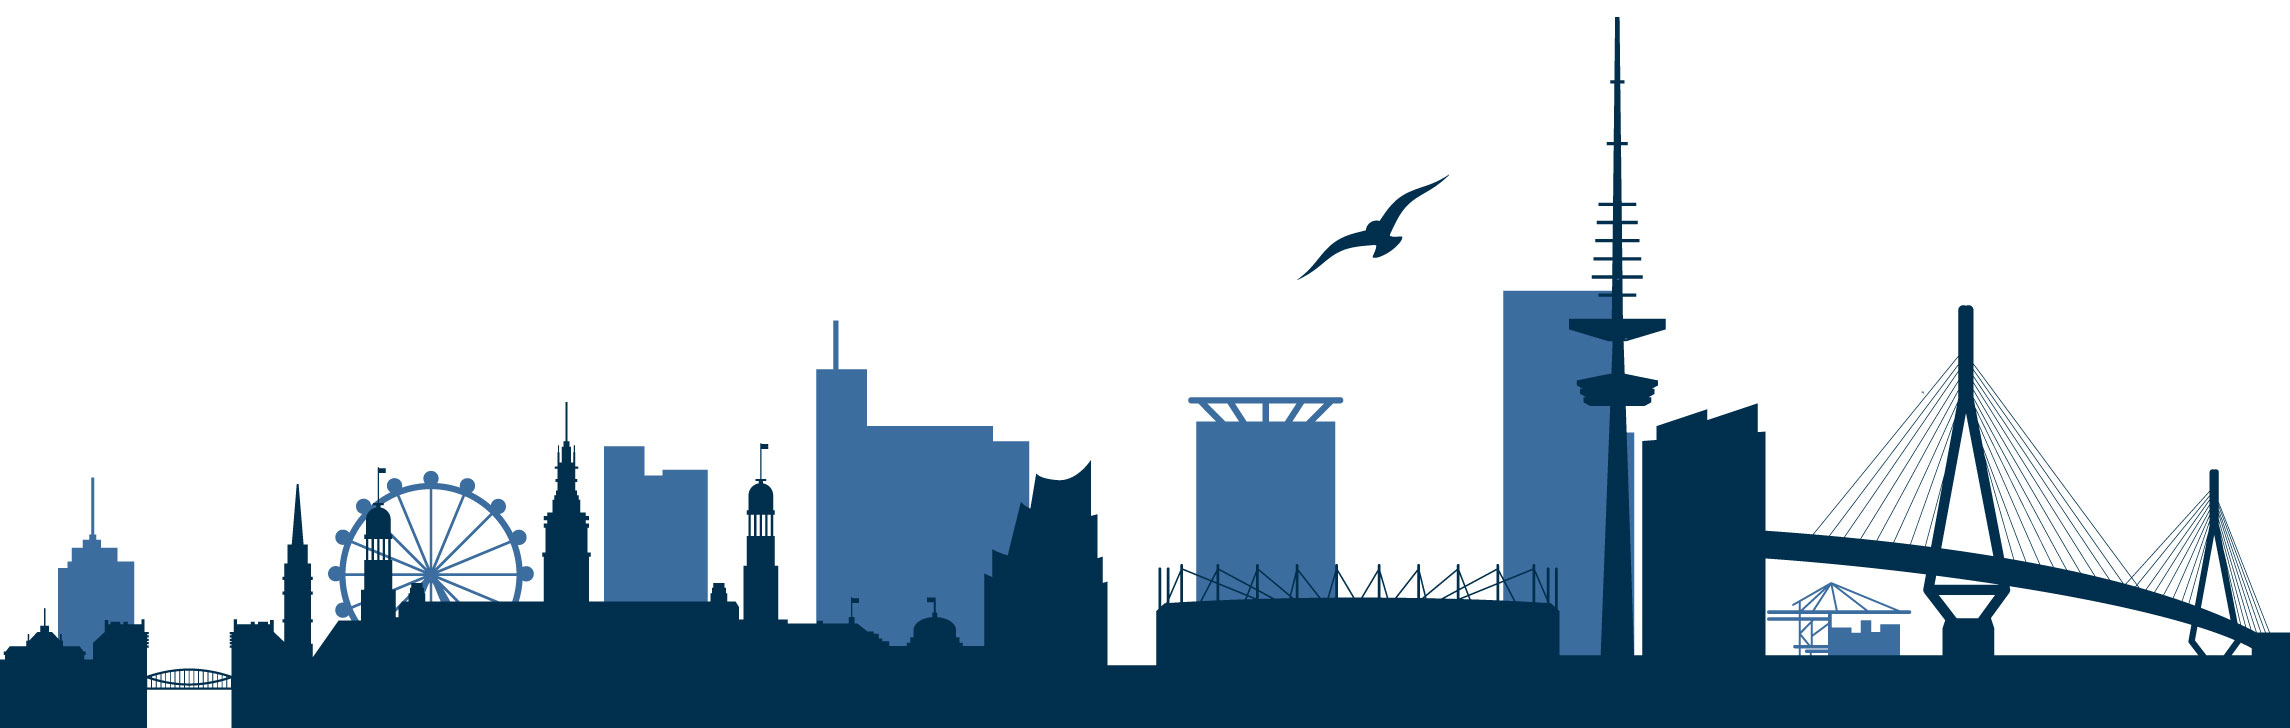 ArztMobil Hamburg Skyline